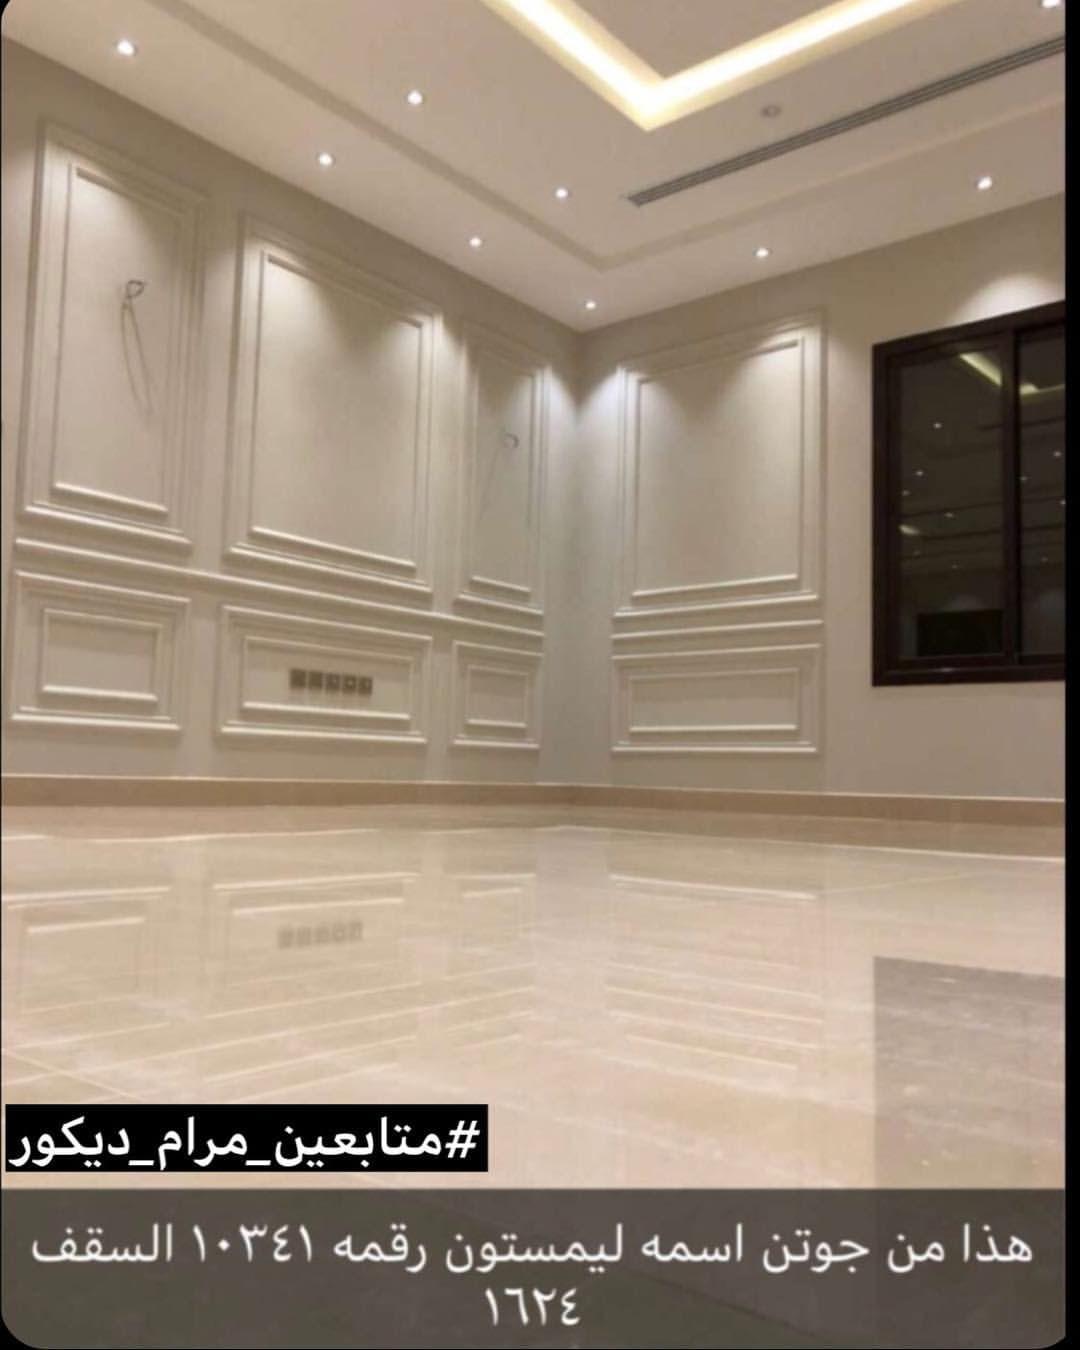 Pin By Ashwaq On ديكور شقه Stylish Bedroom Decor Comfy Living Room Decor House Ceiling Design